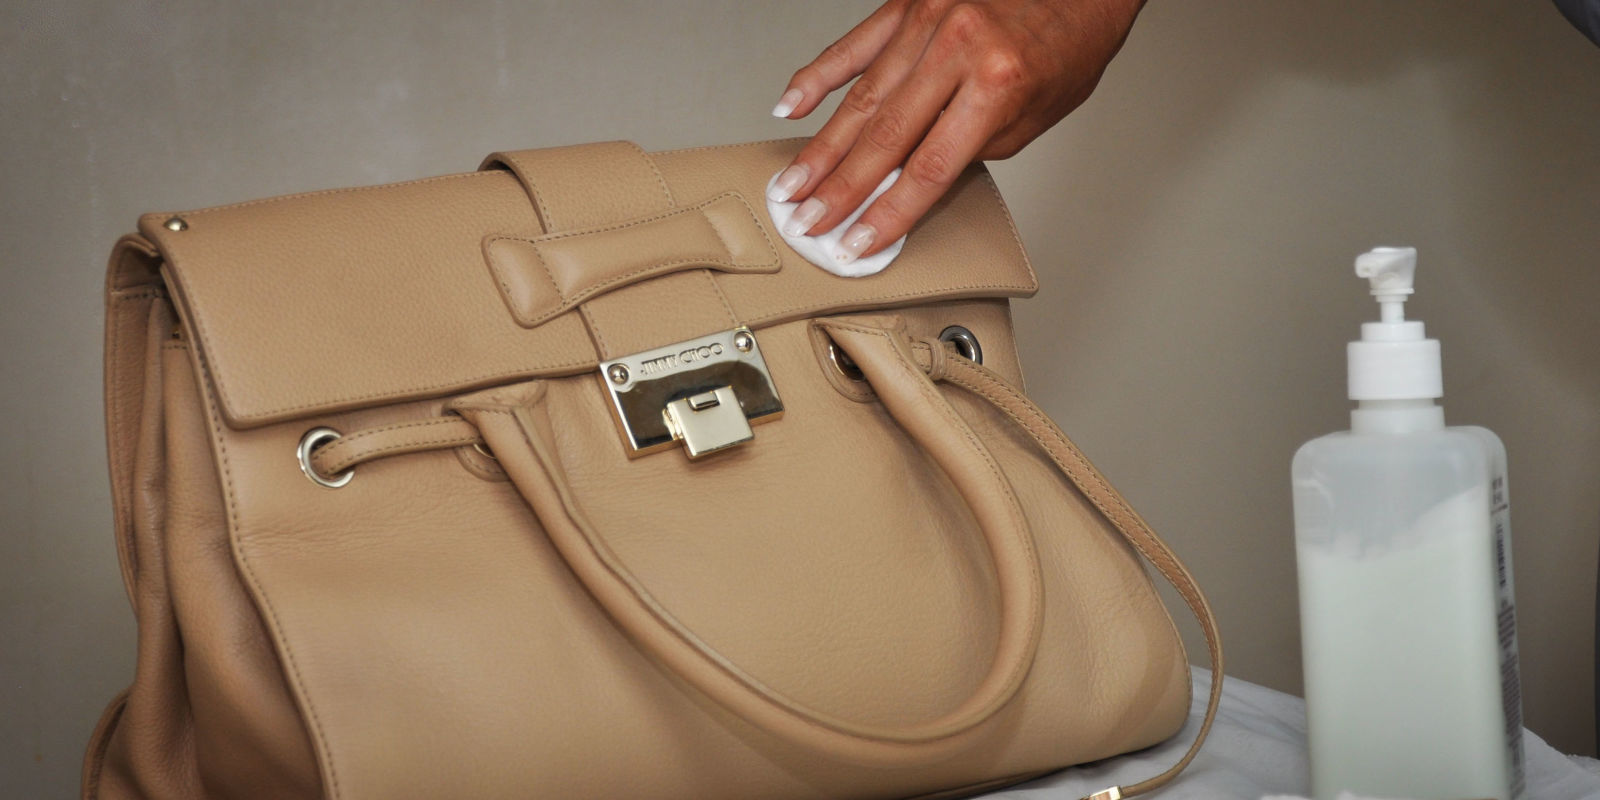 Почистить кожаную сумку домашних условиях